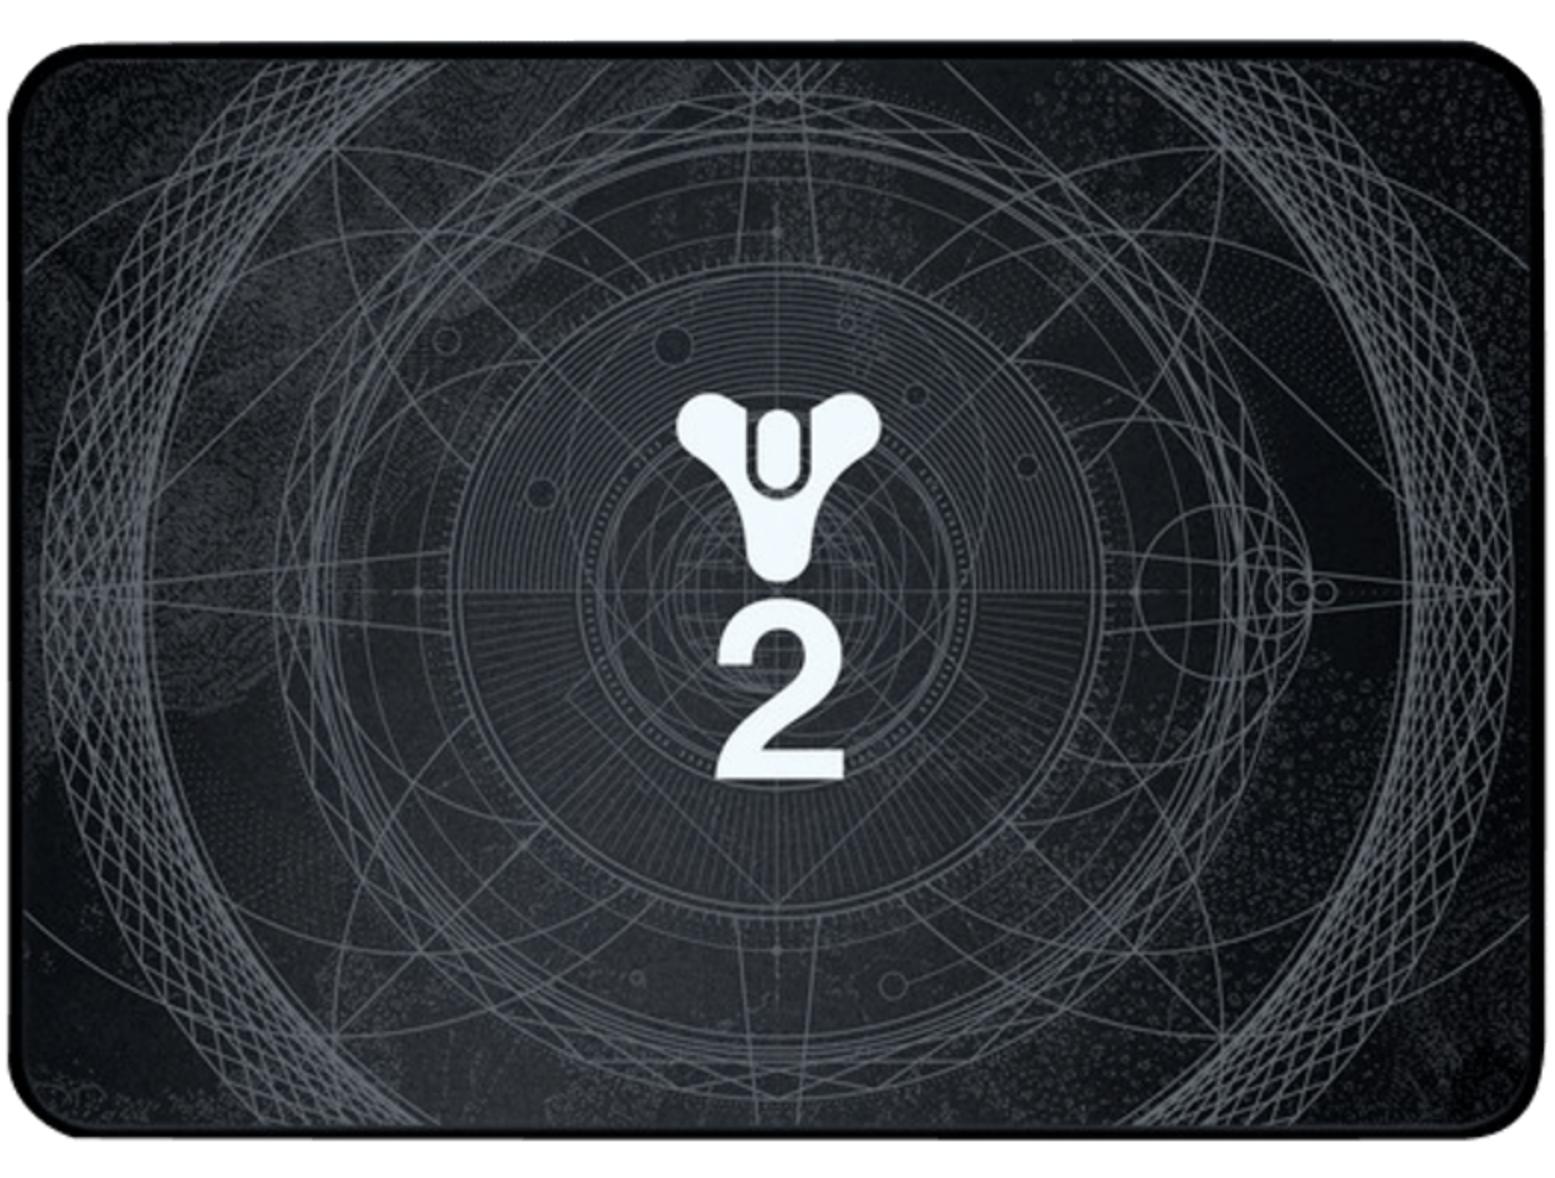 RAZER Goliathus Destiny 2 Edition Gaming Mauspad nur 7,50 Euro inkl. Versand